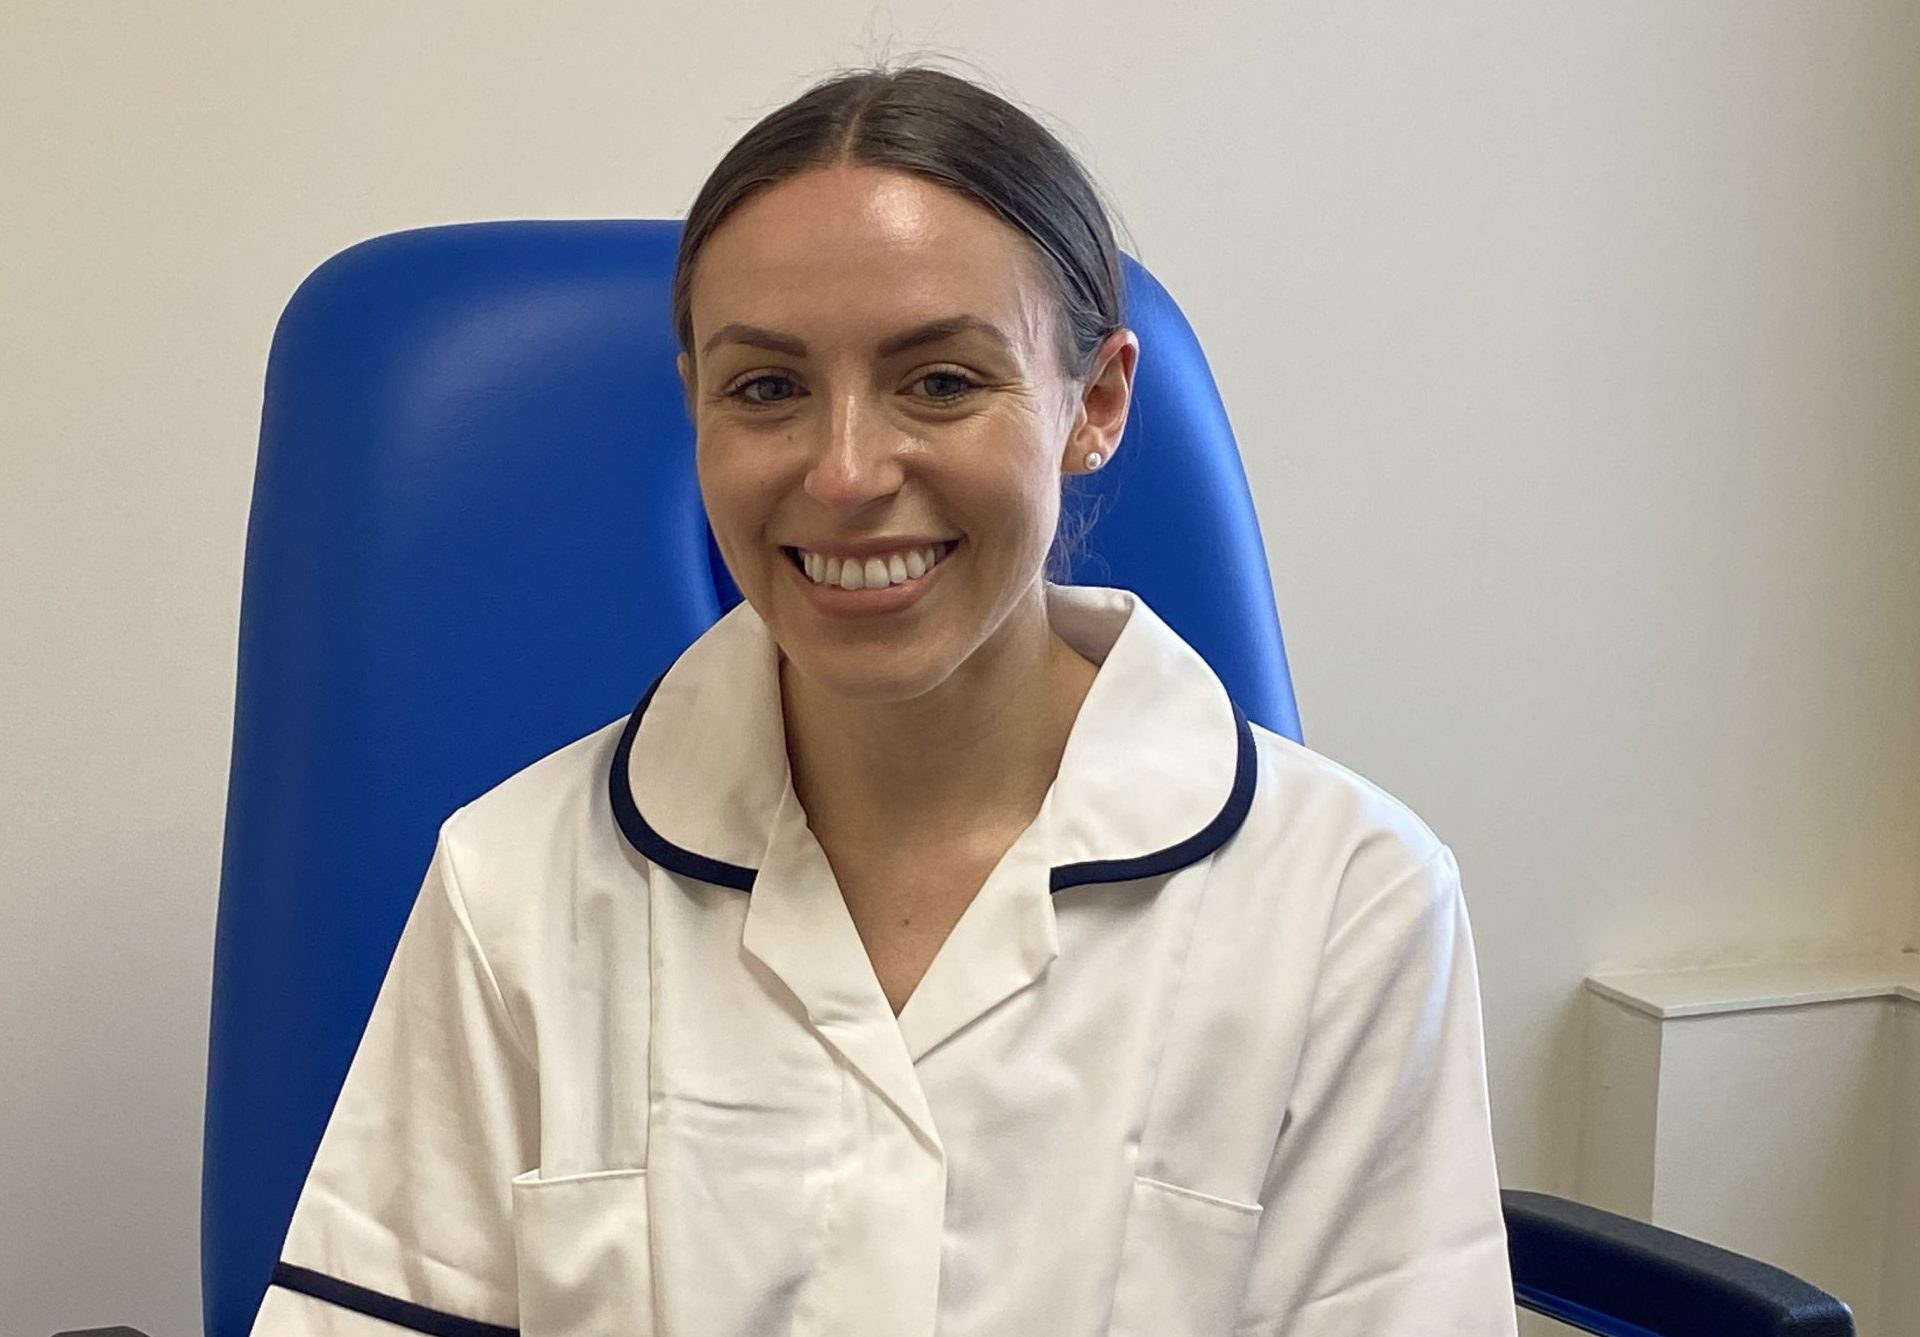 Louisa Smart Podiatrist Northwich Foot Clinic